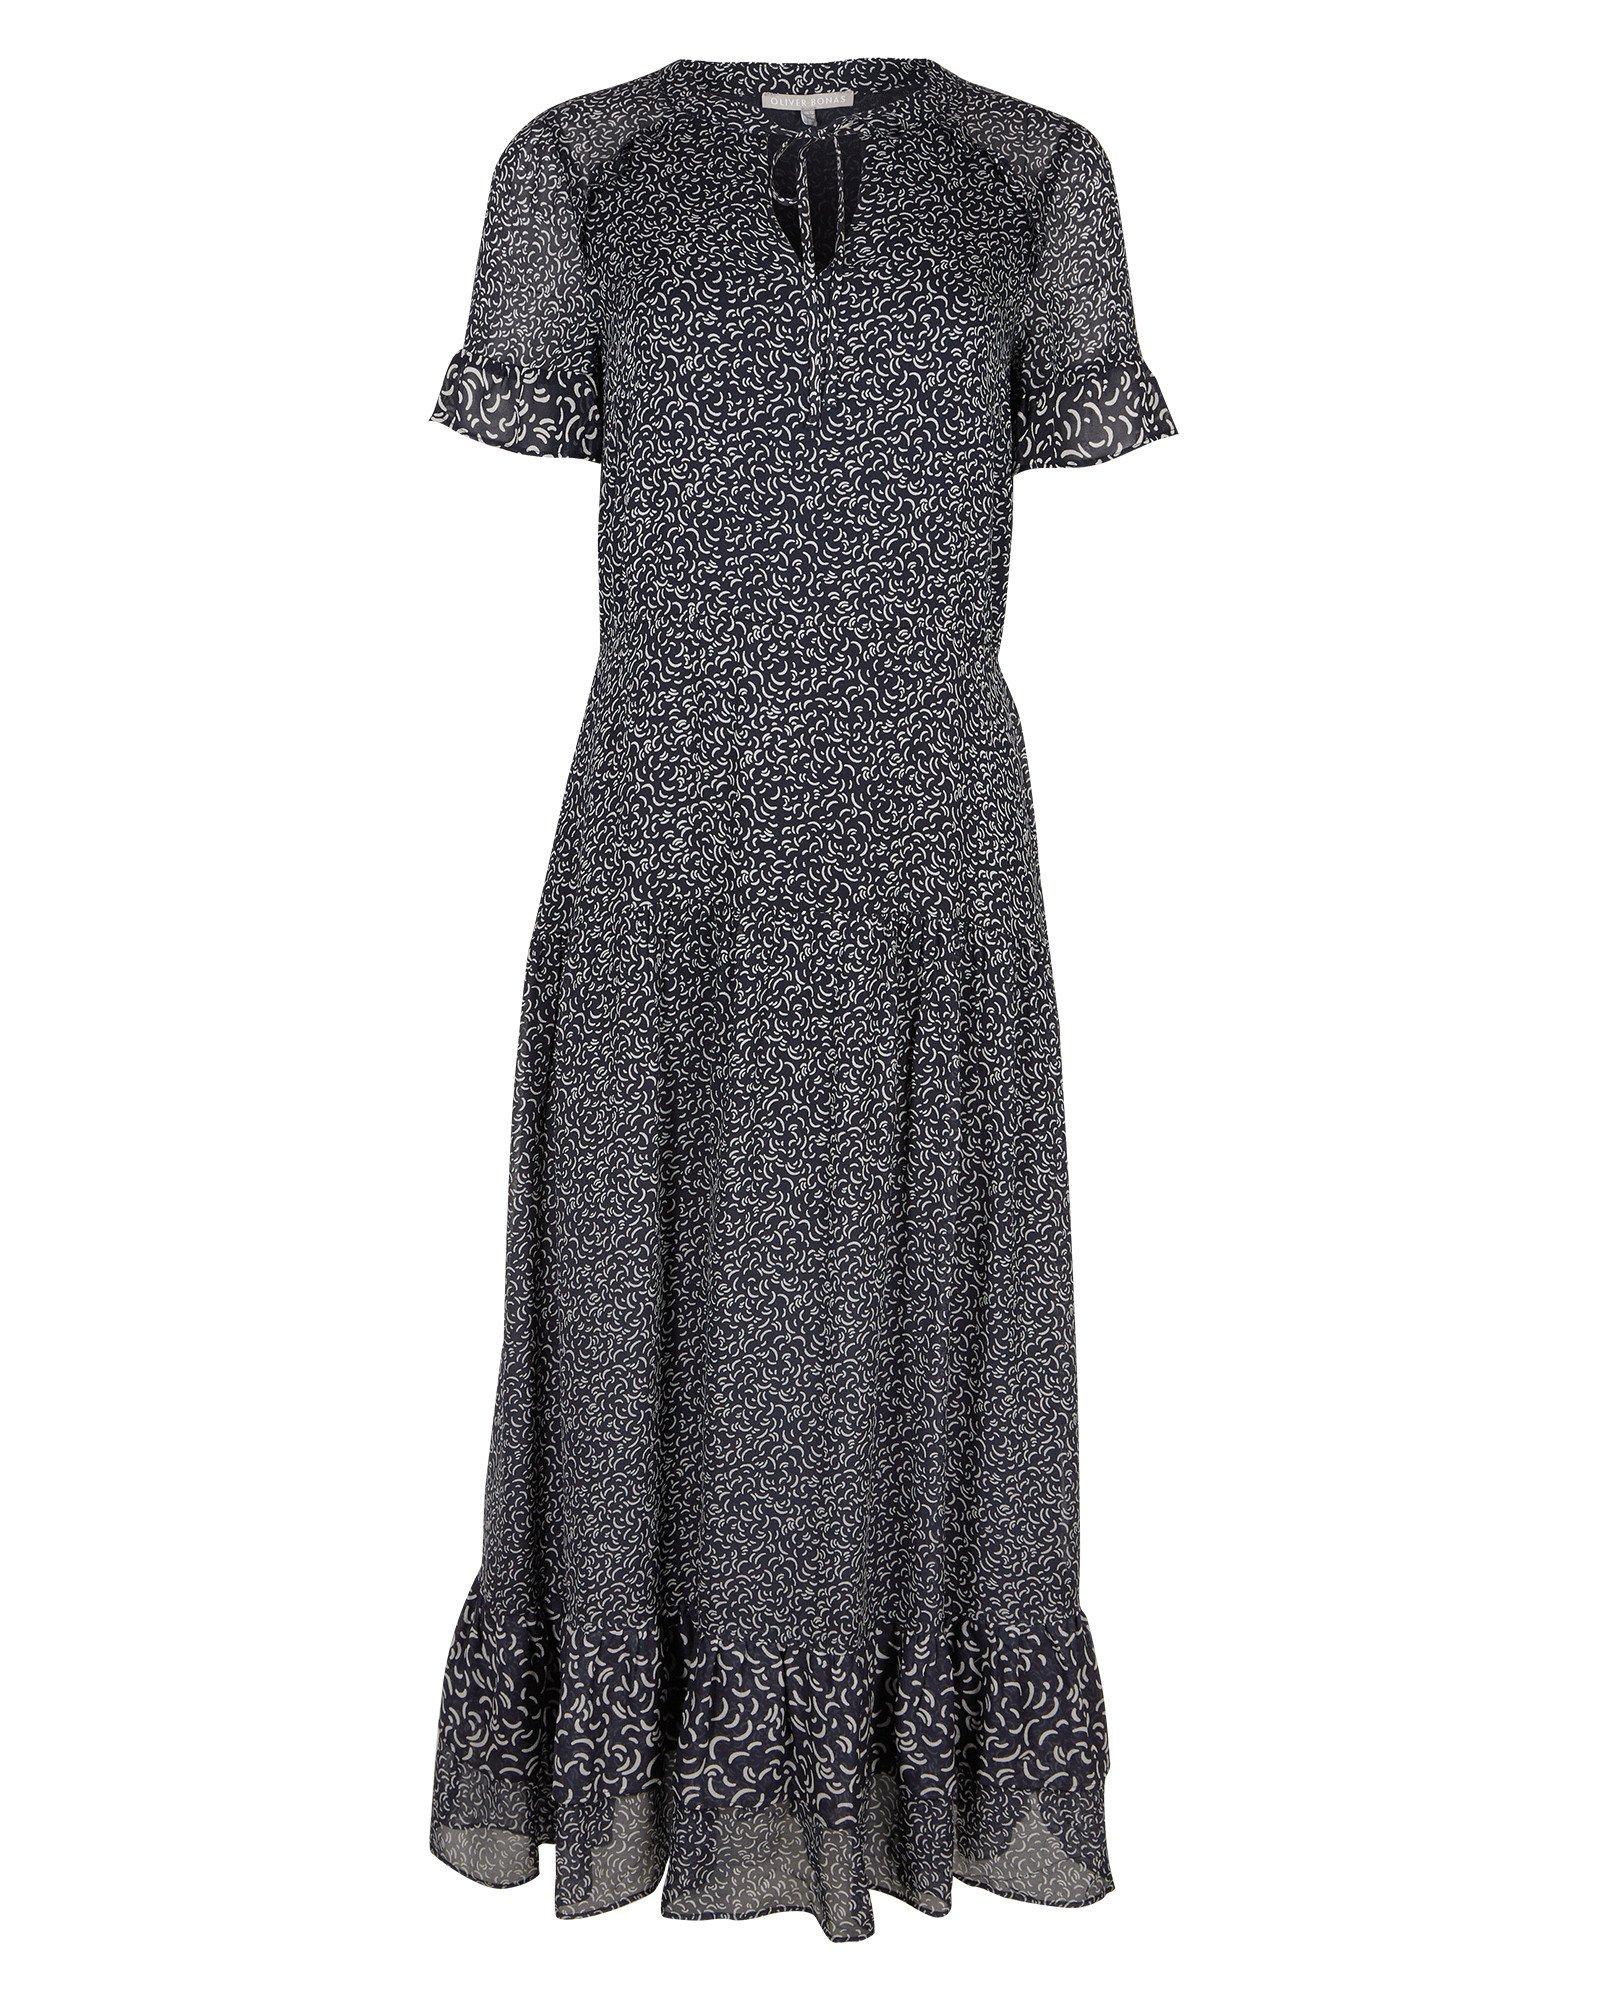 Timely Texture Blue Midi Dress